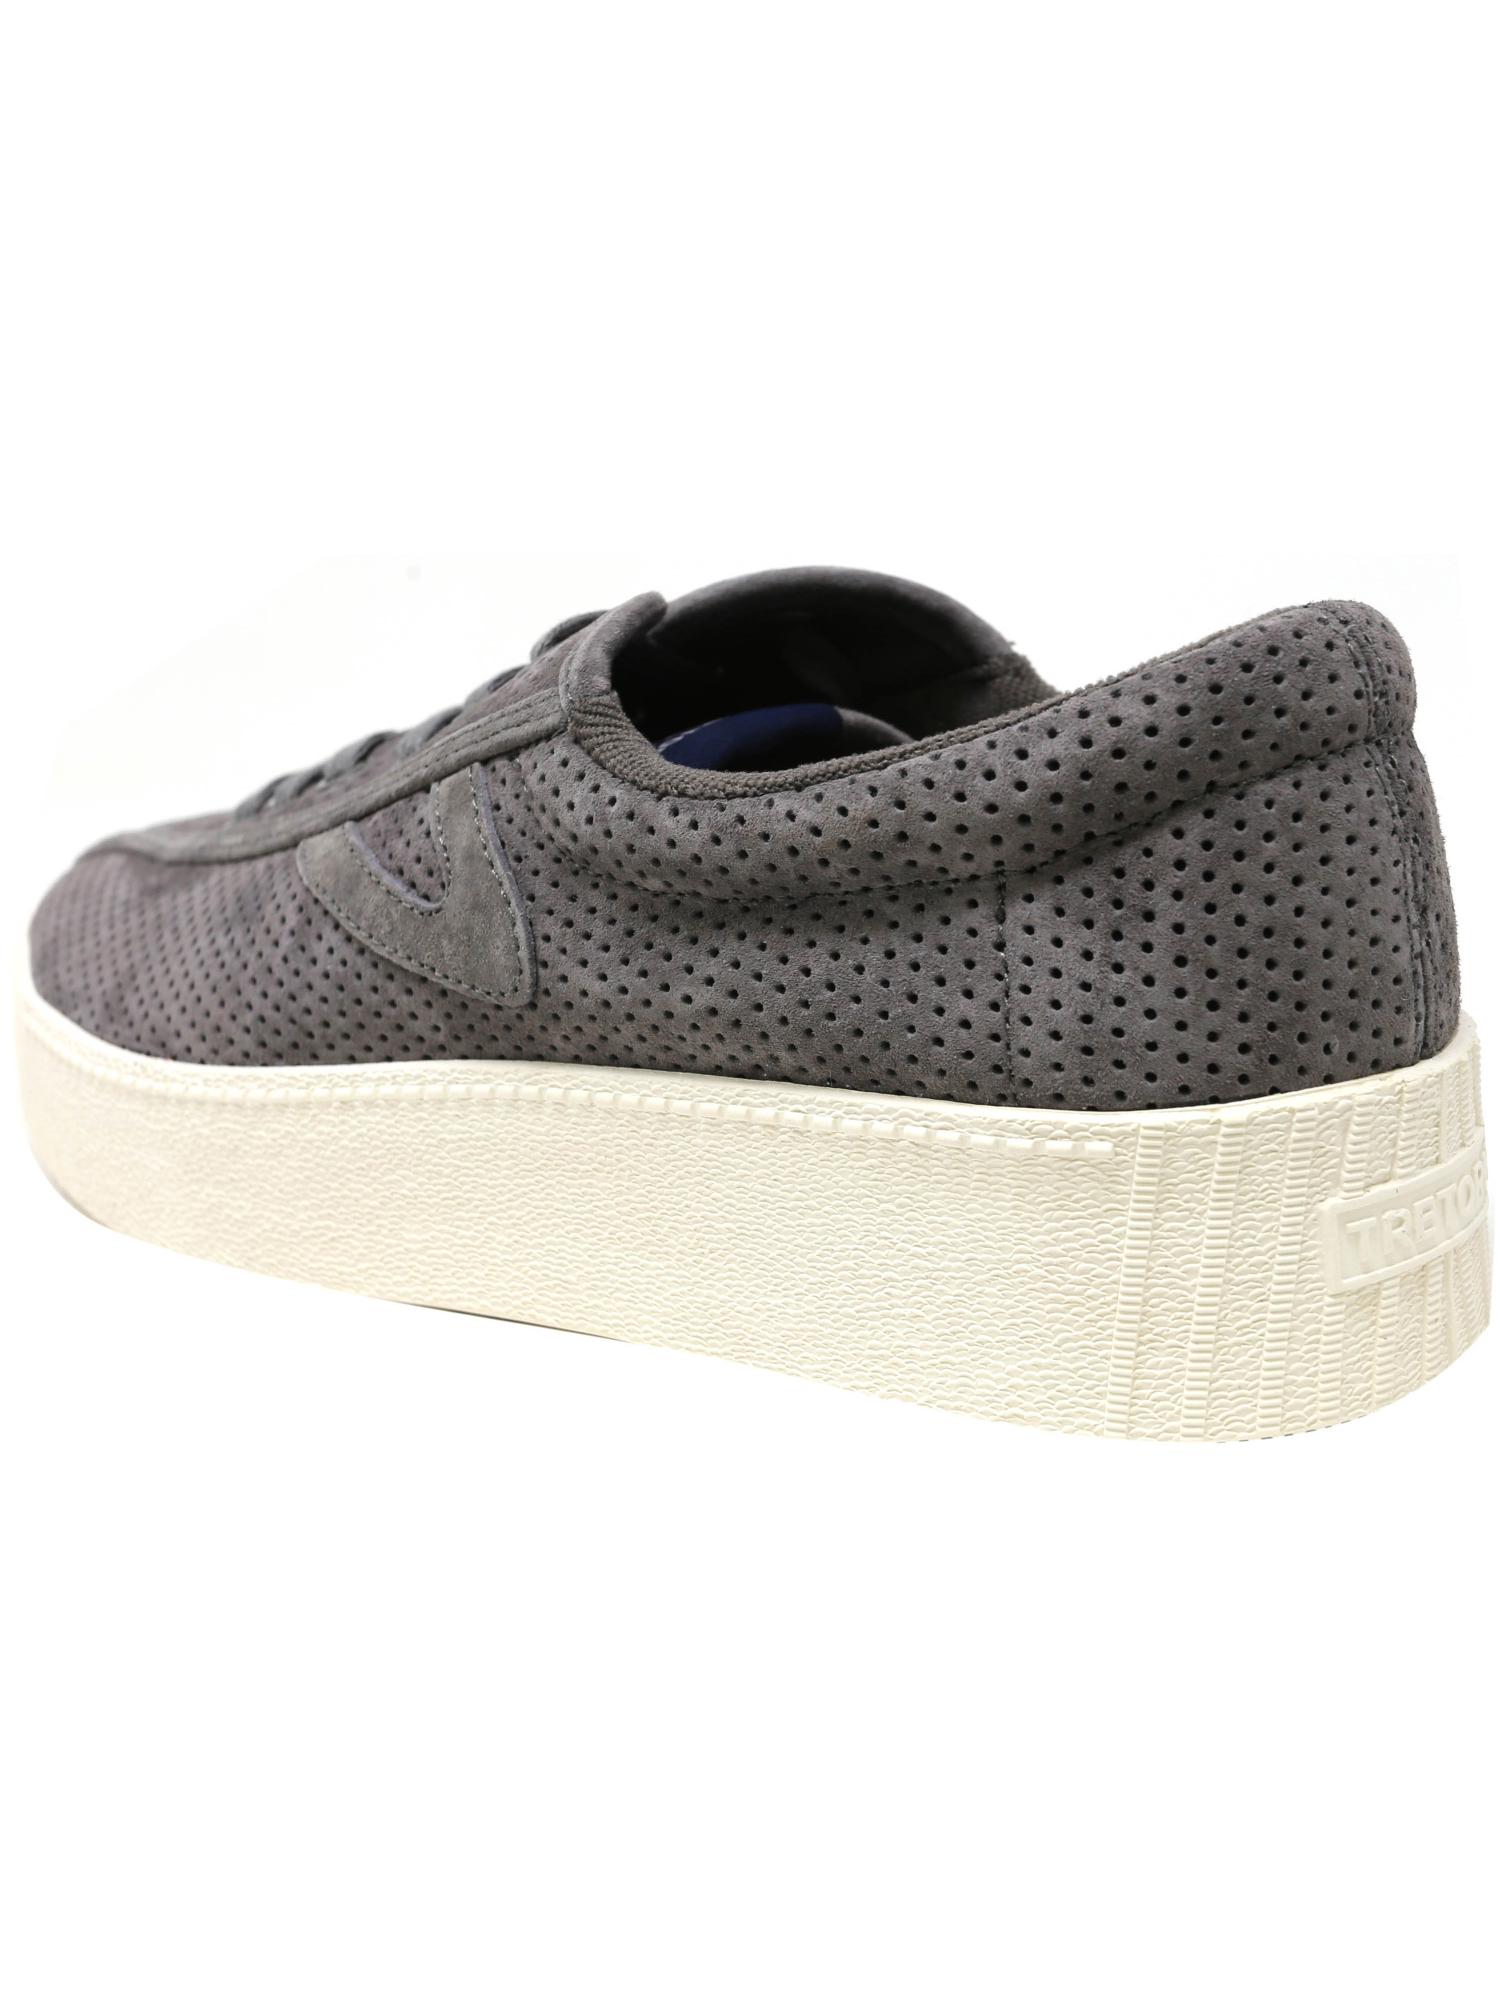 Tretorn-Nylite-3-Bold-Suede-Fashion-Sneaker thumbnail 13